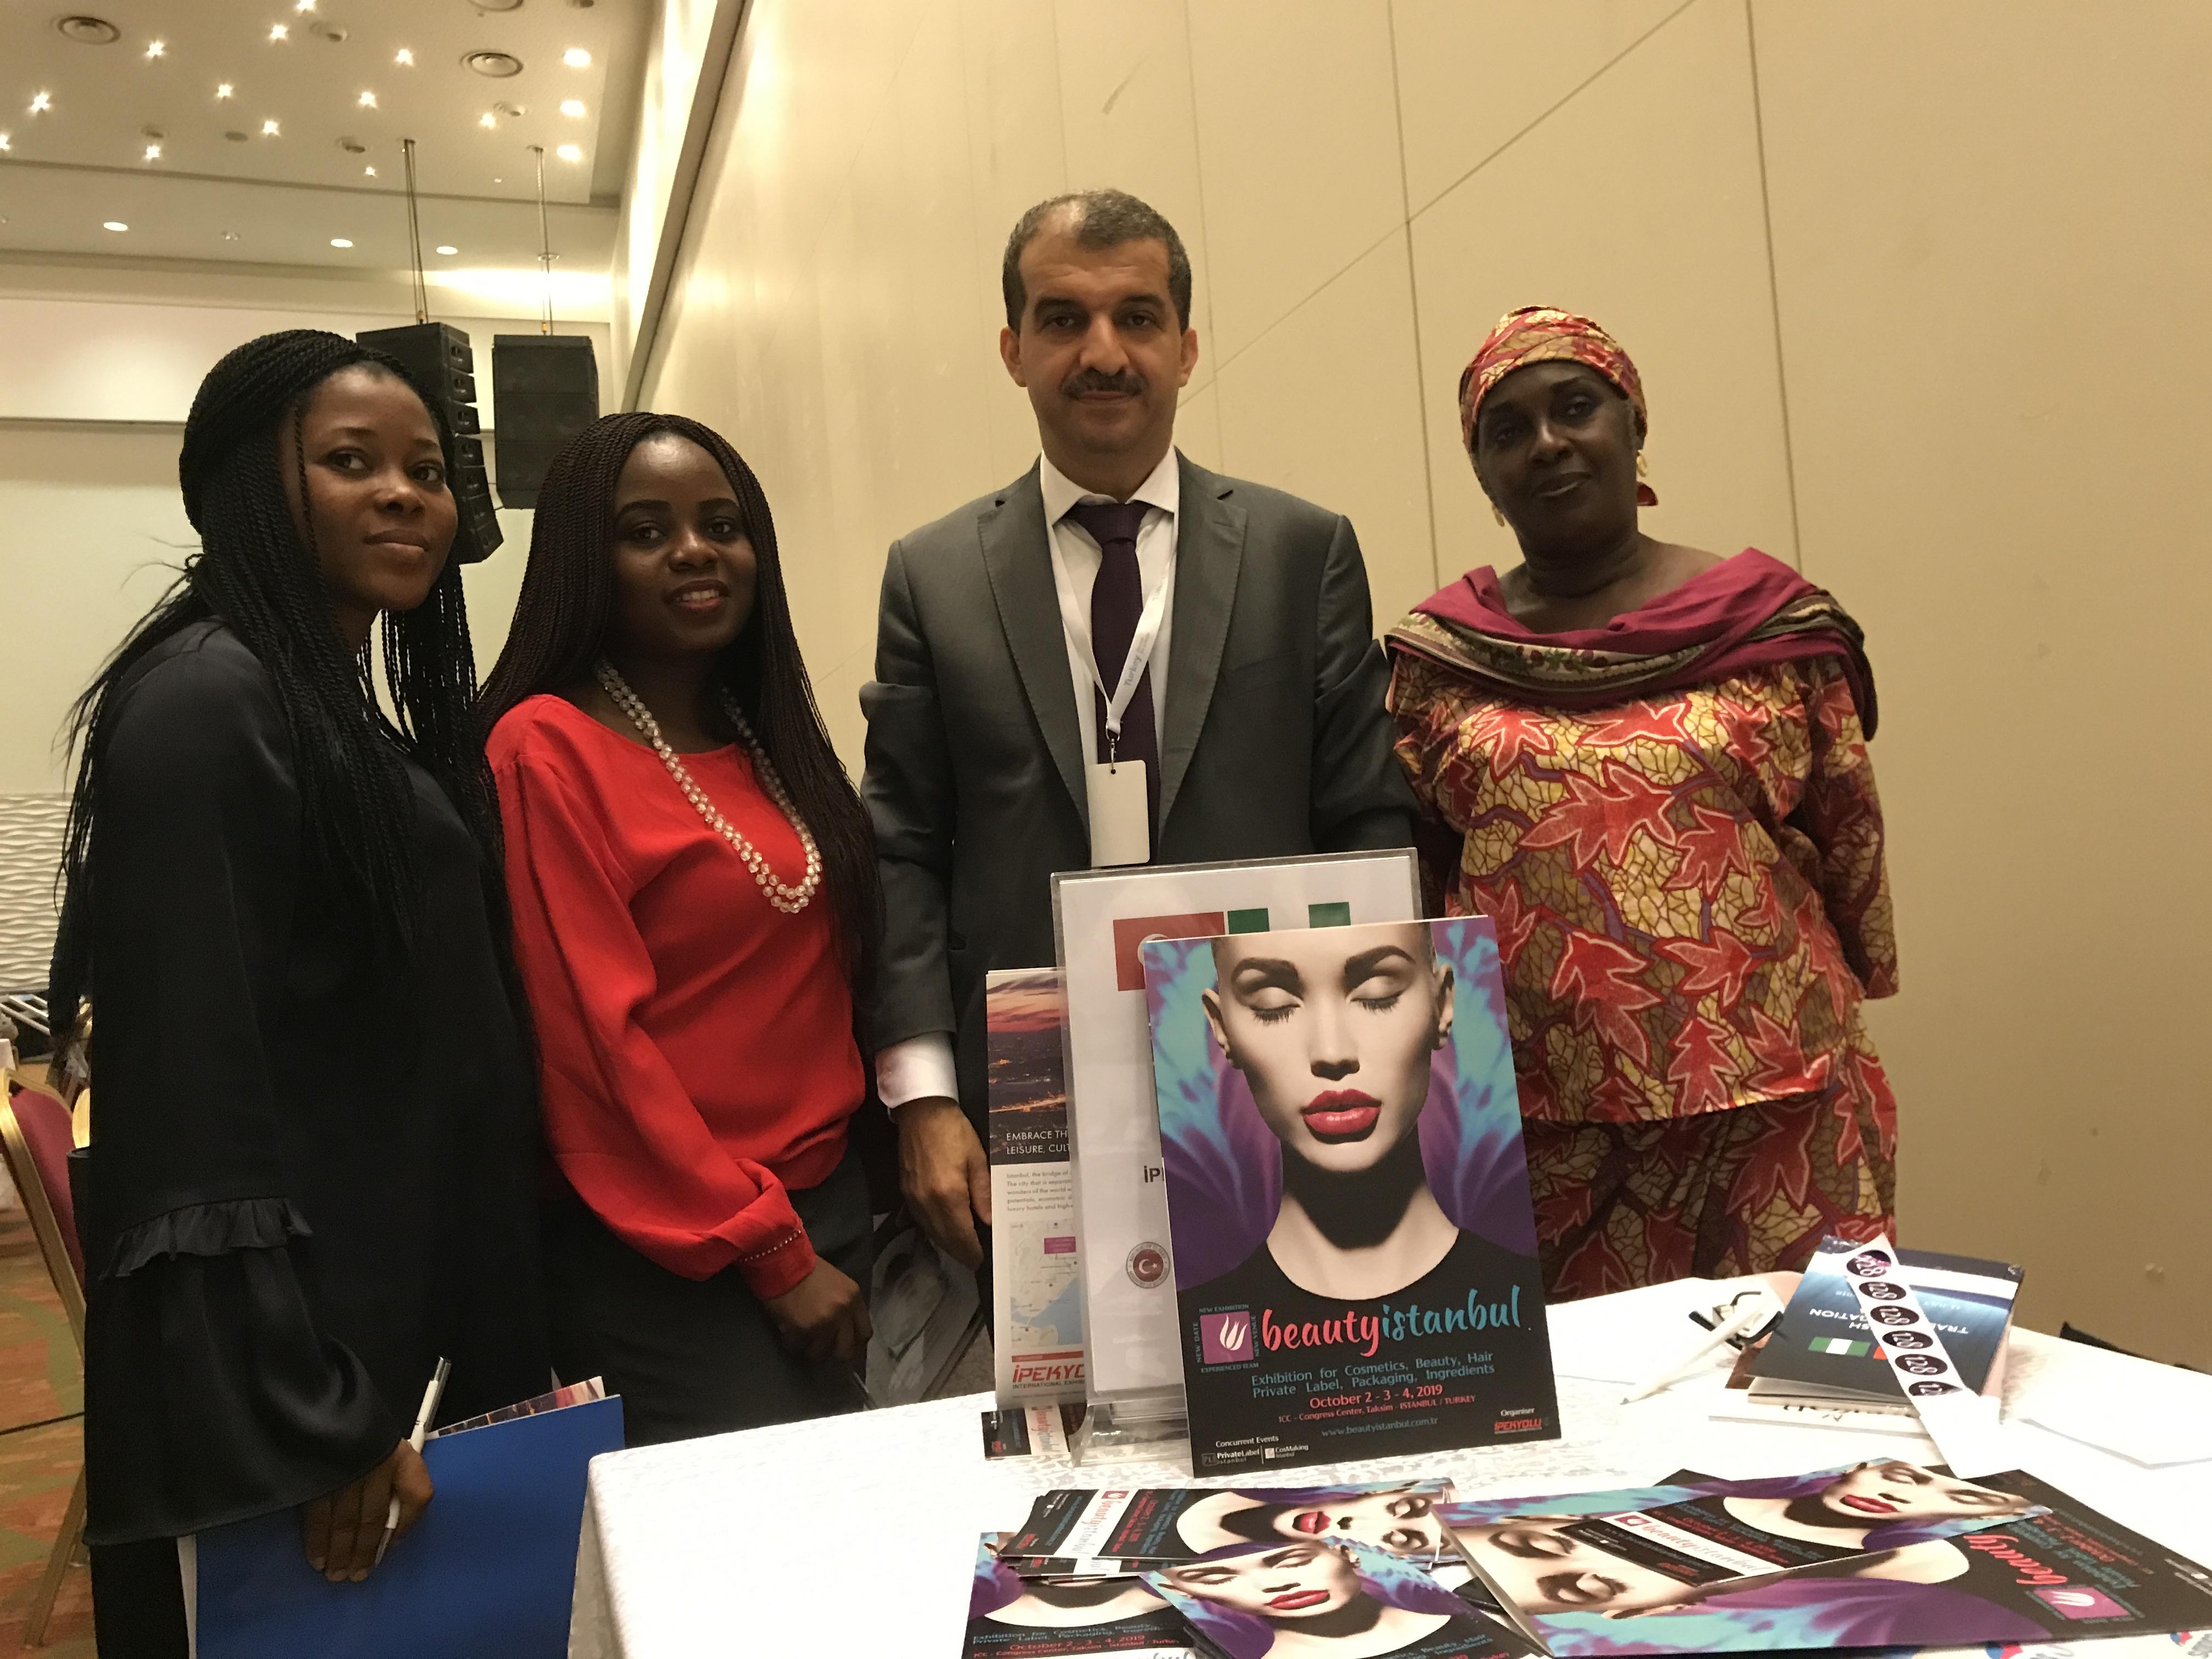 Nigeria Business Forum, Lagos-Nigeria, July 2018